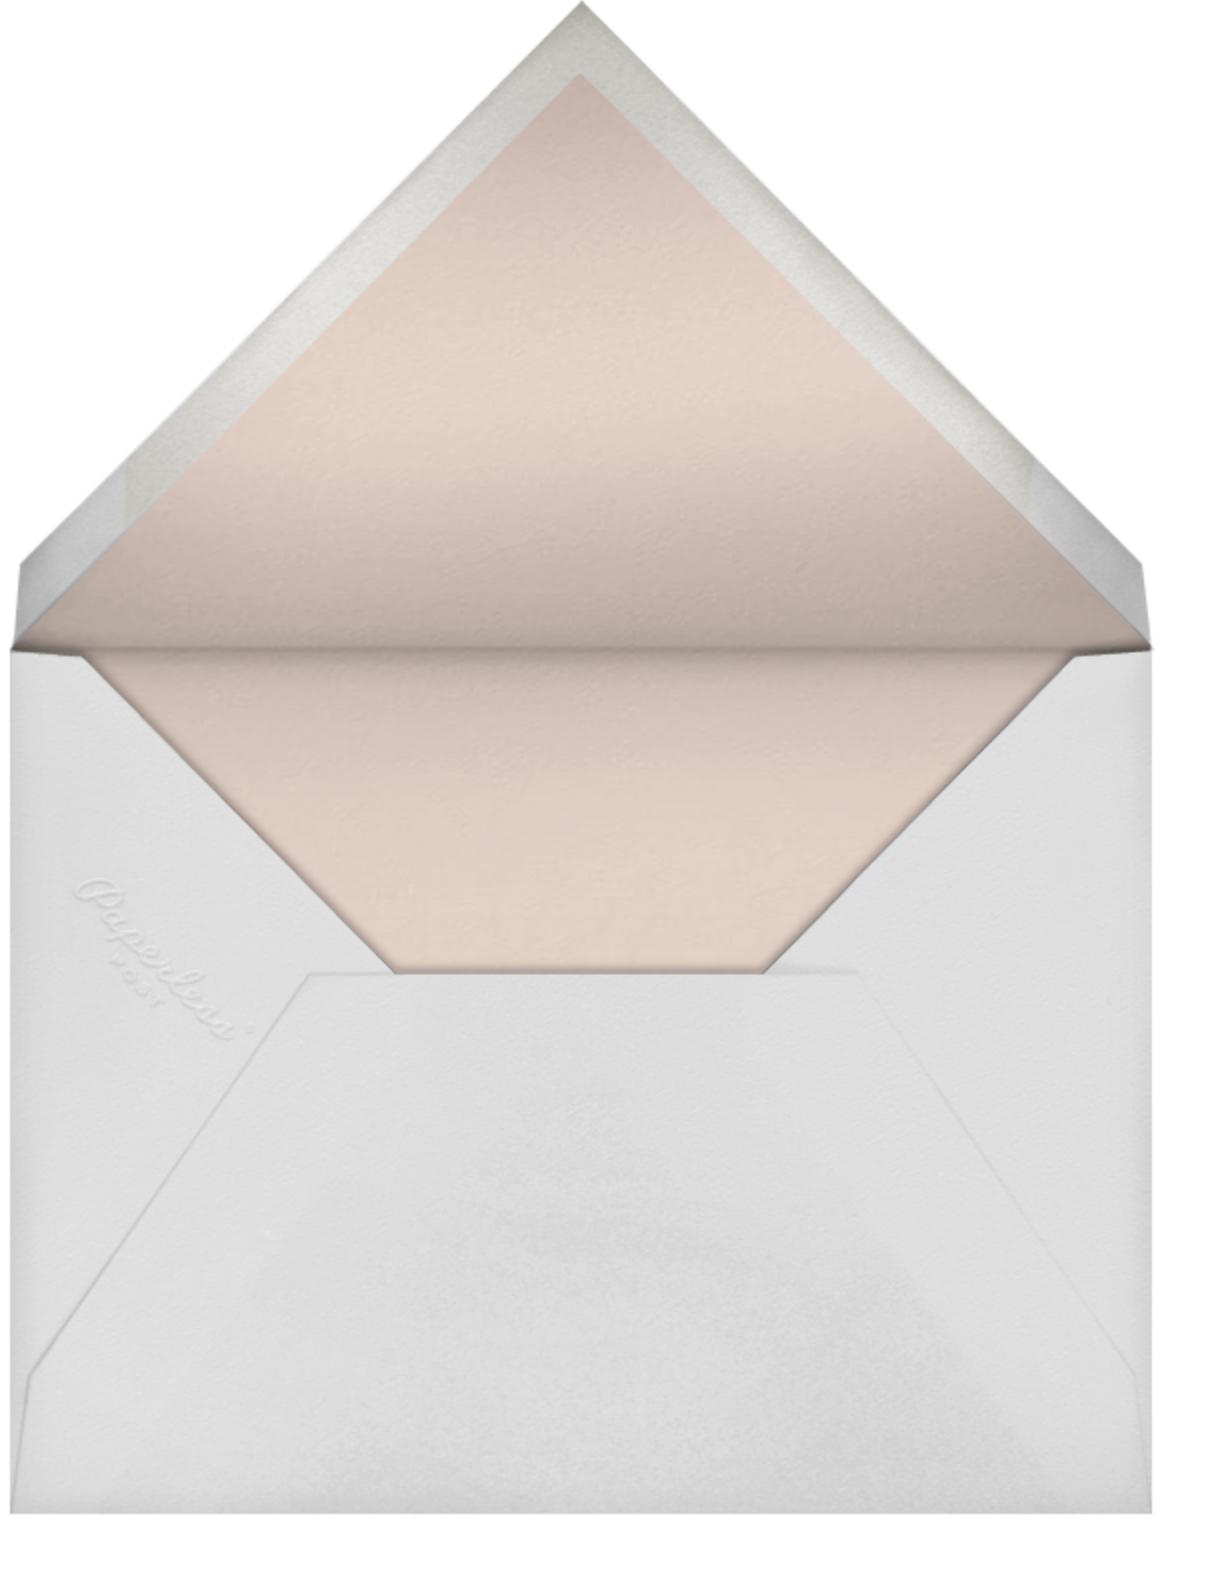 Diaper Pin - Pink - kate spade new york - Birth - envelope back